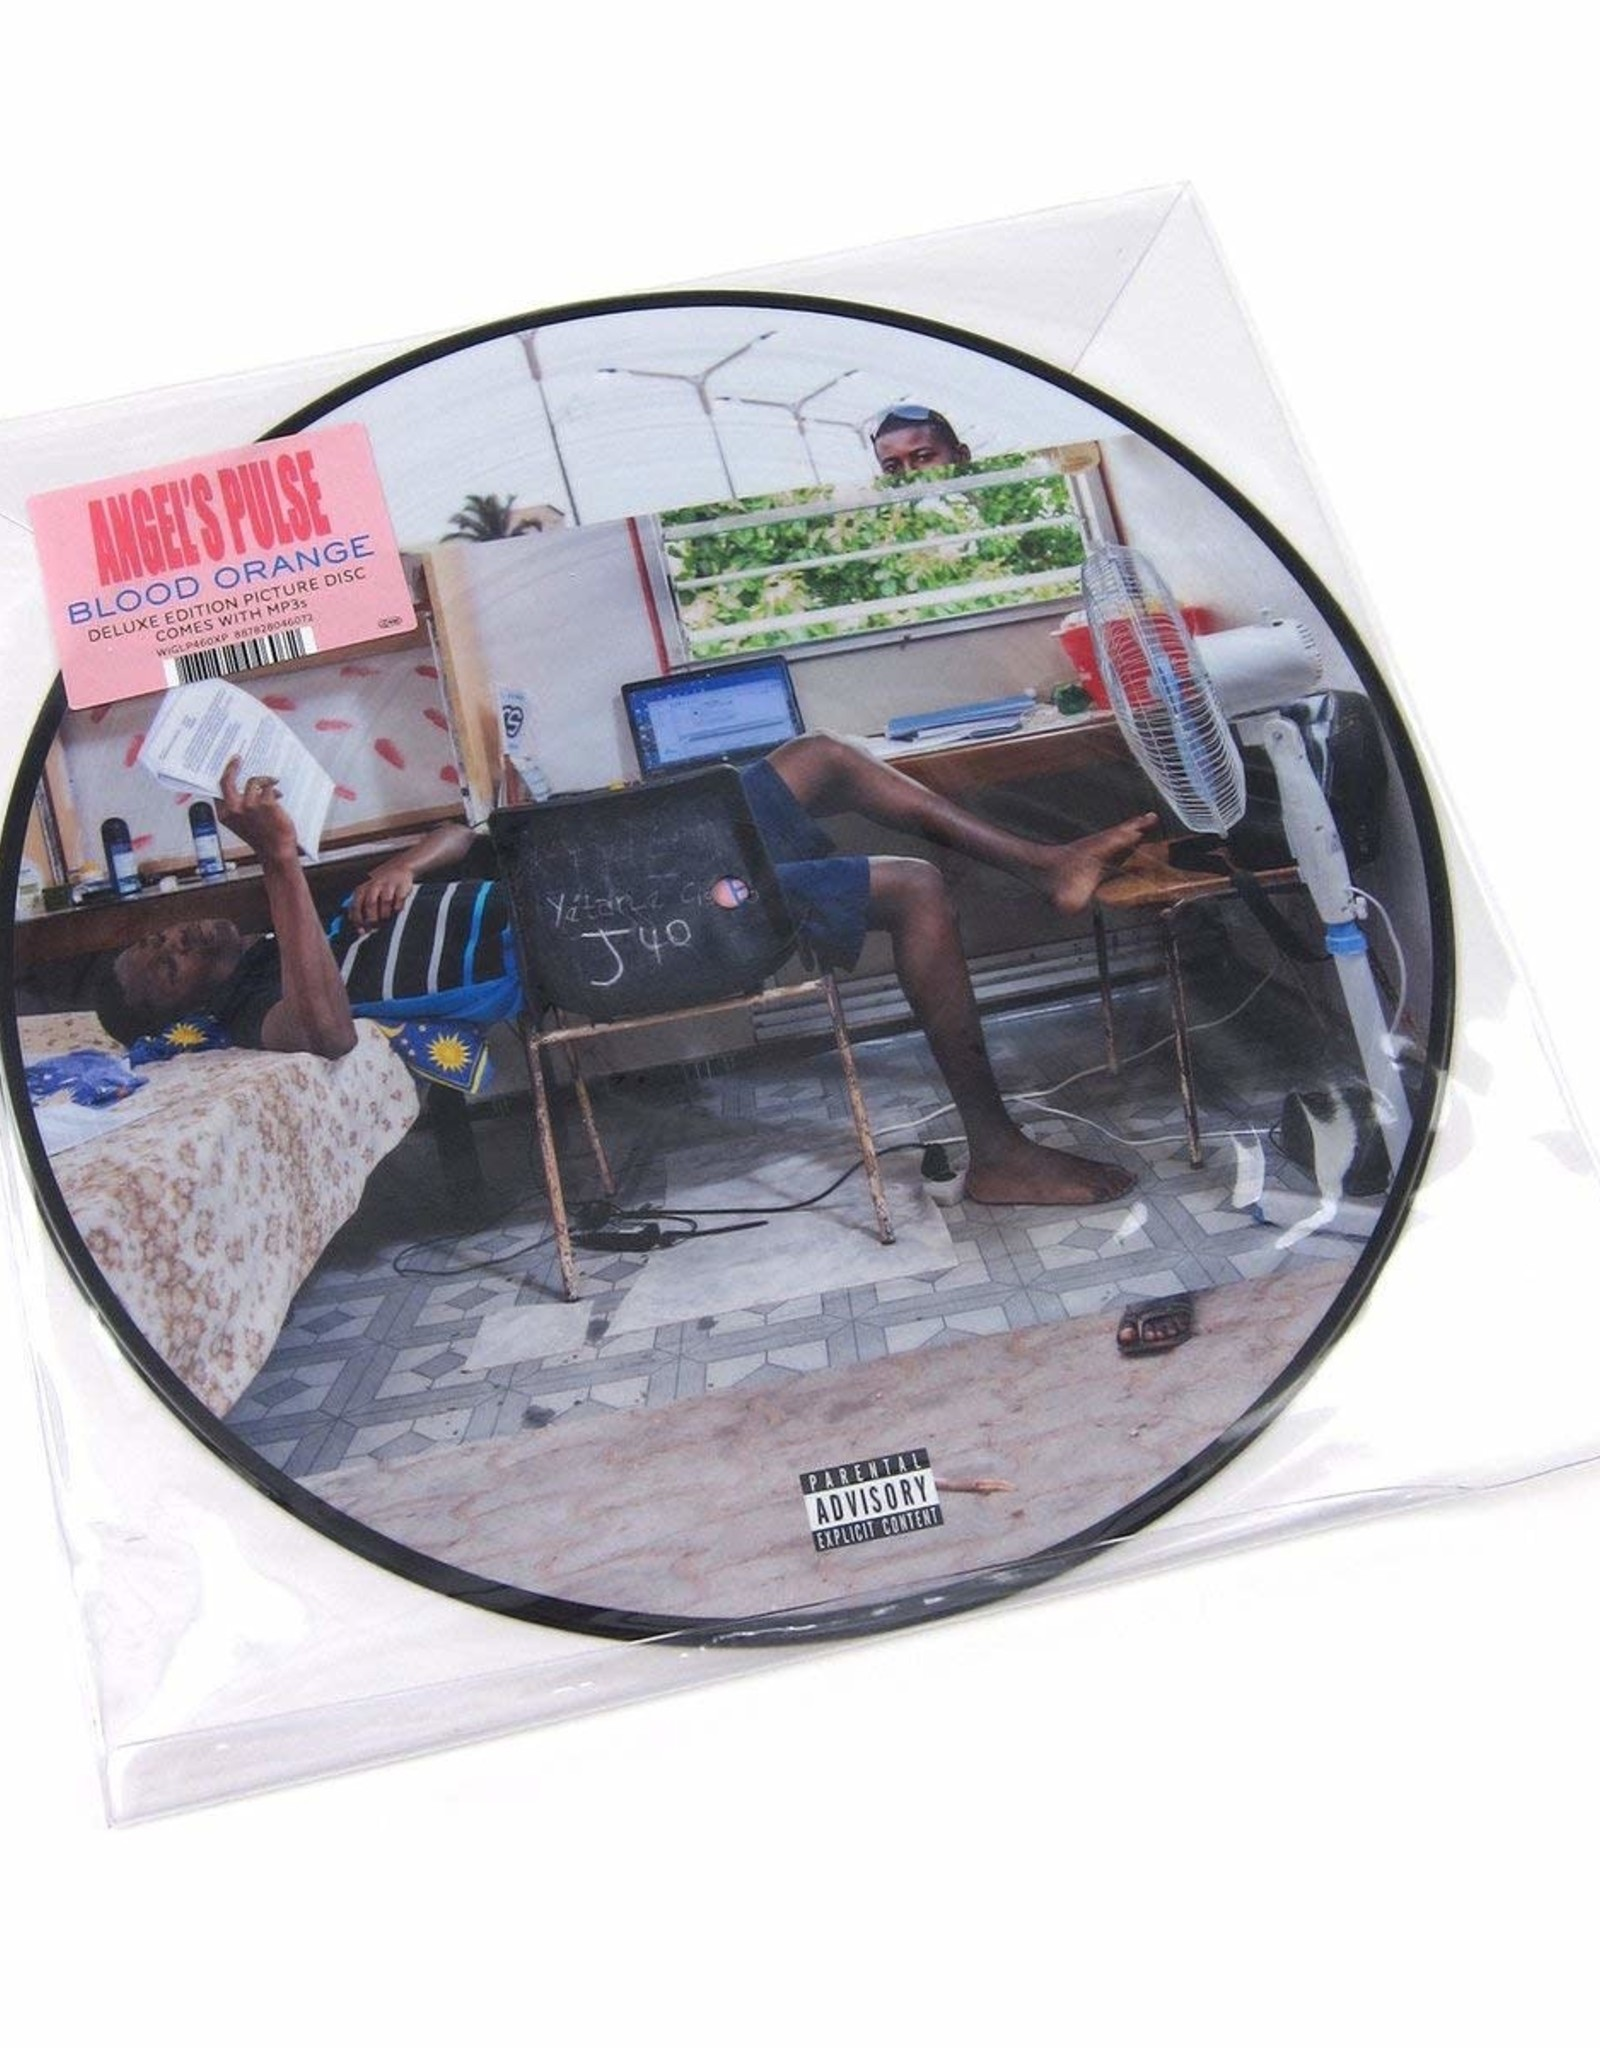 Blood Orange - Angel's Pulse (Picture Disc)